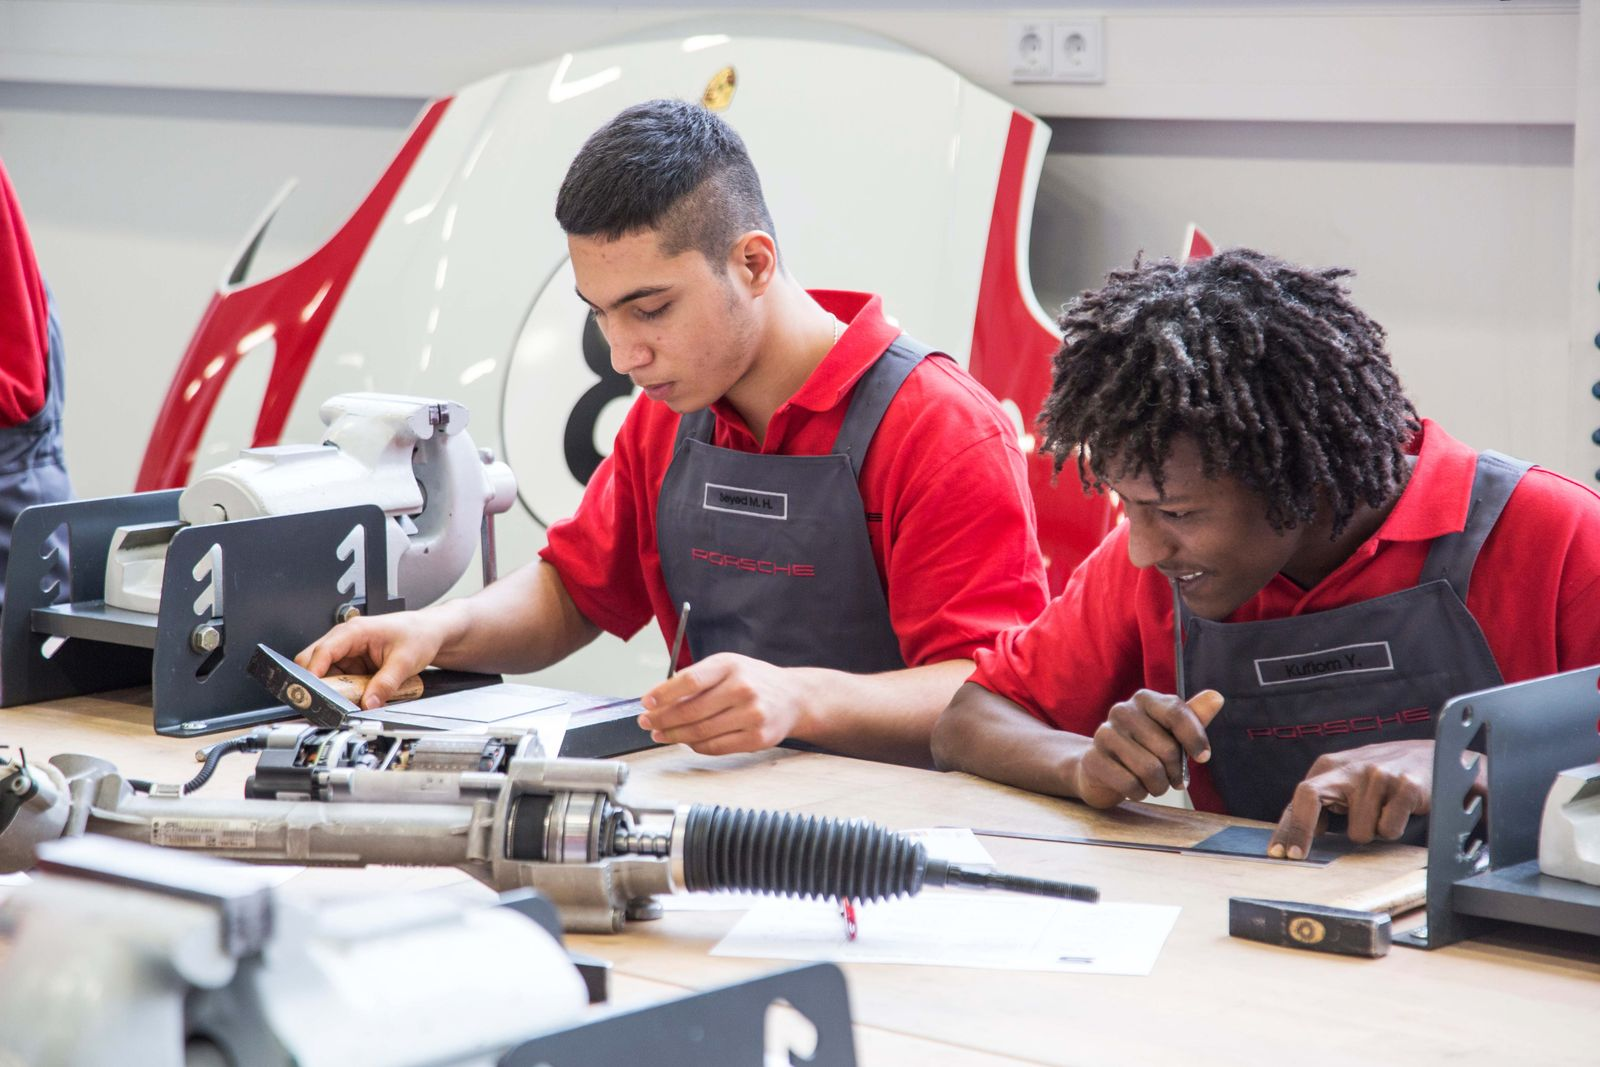 Flüchtlinge / Porsche / Job / Ausbildung